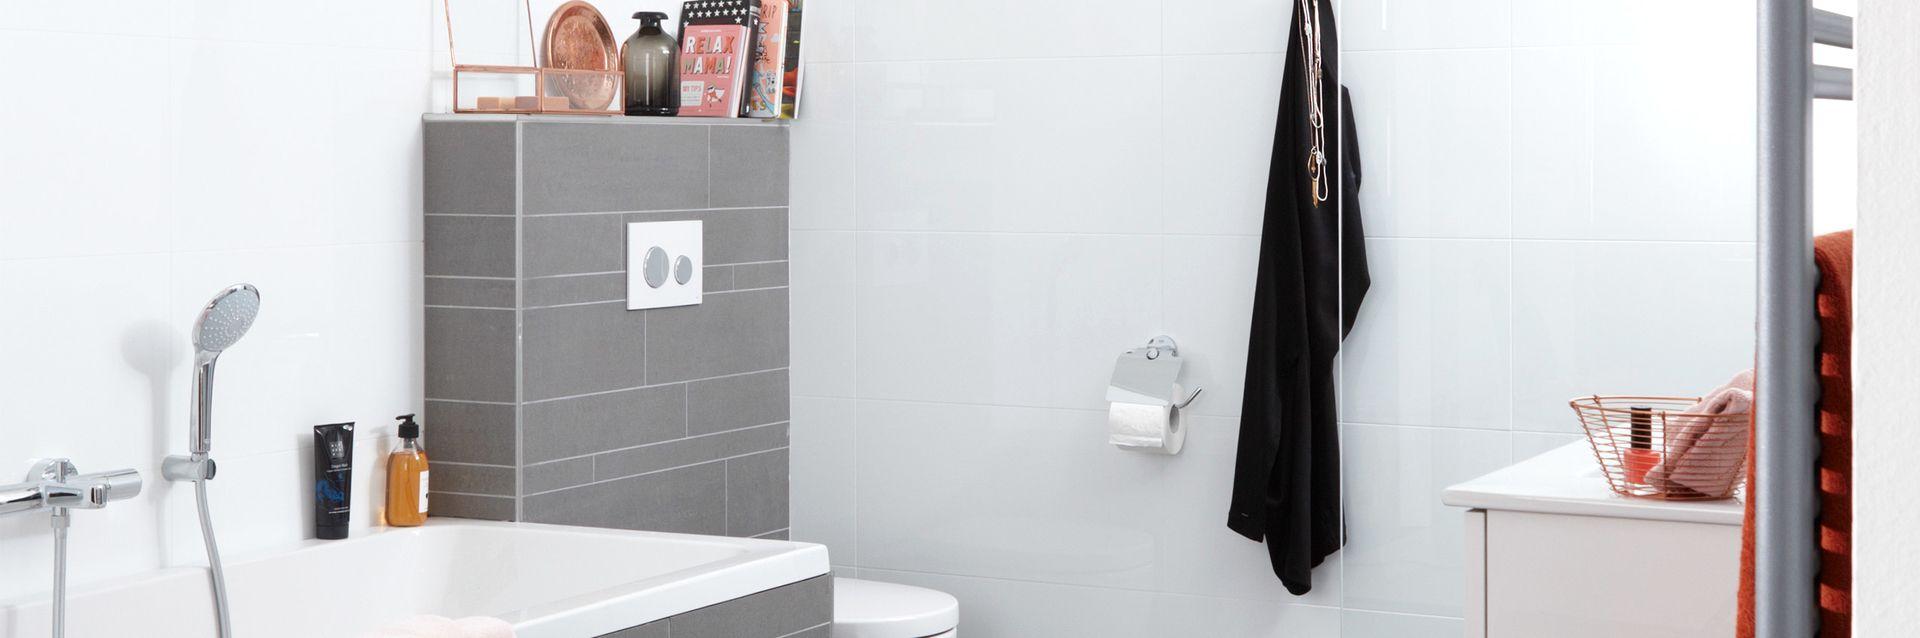 Budget badkamer - Budget badkamer